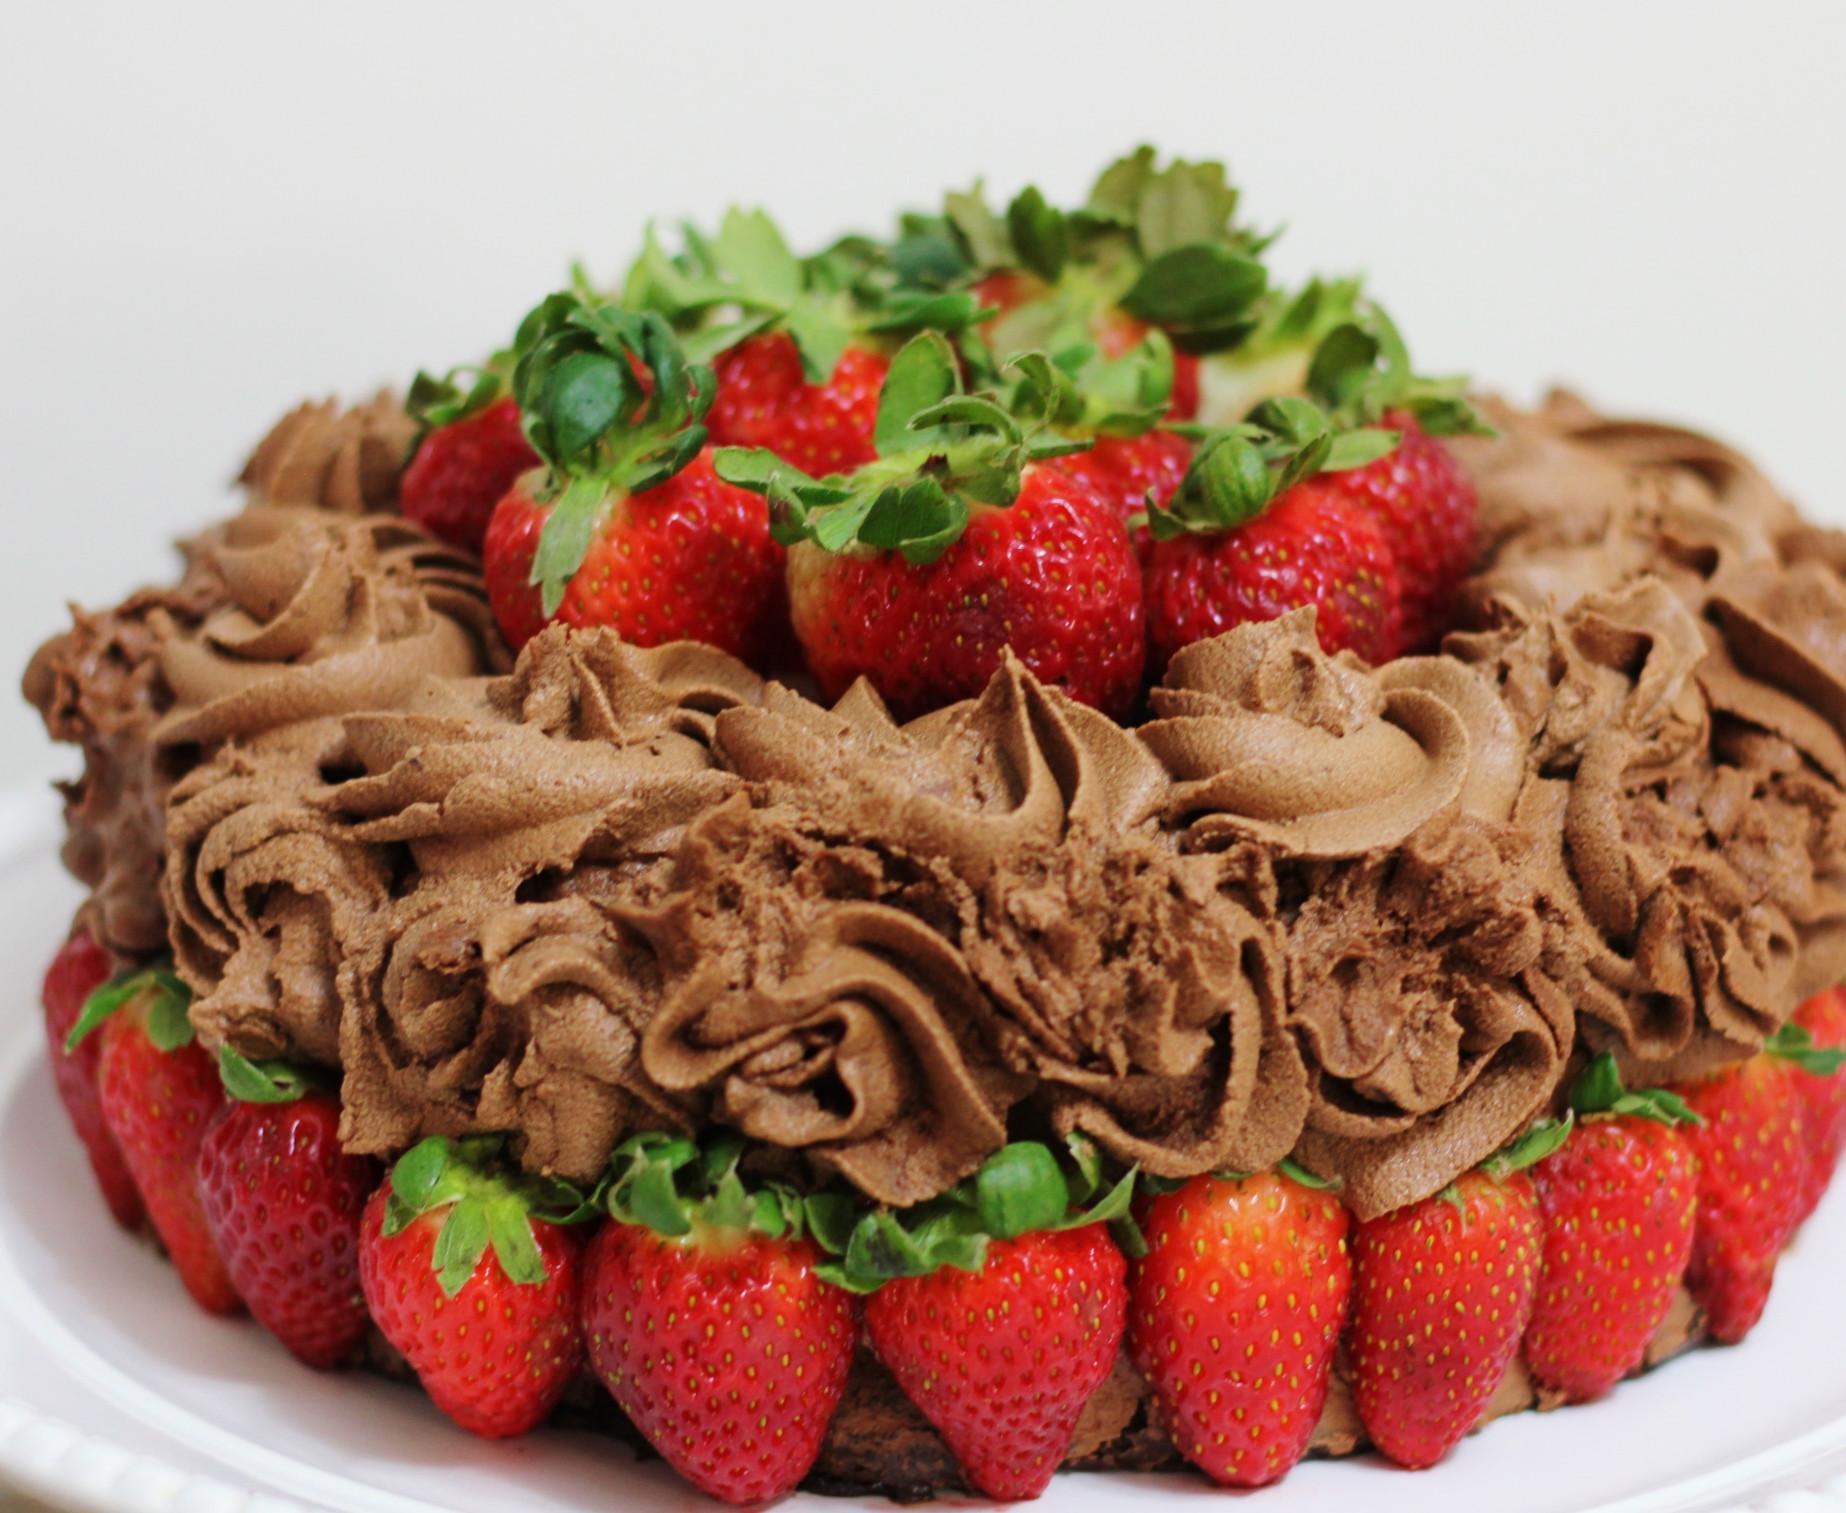 Dairy Free Birthday Cake Recipe  The Ultimate Chocolate Birthday Cake gluten free dairy